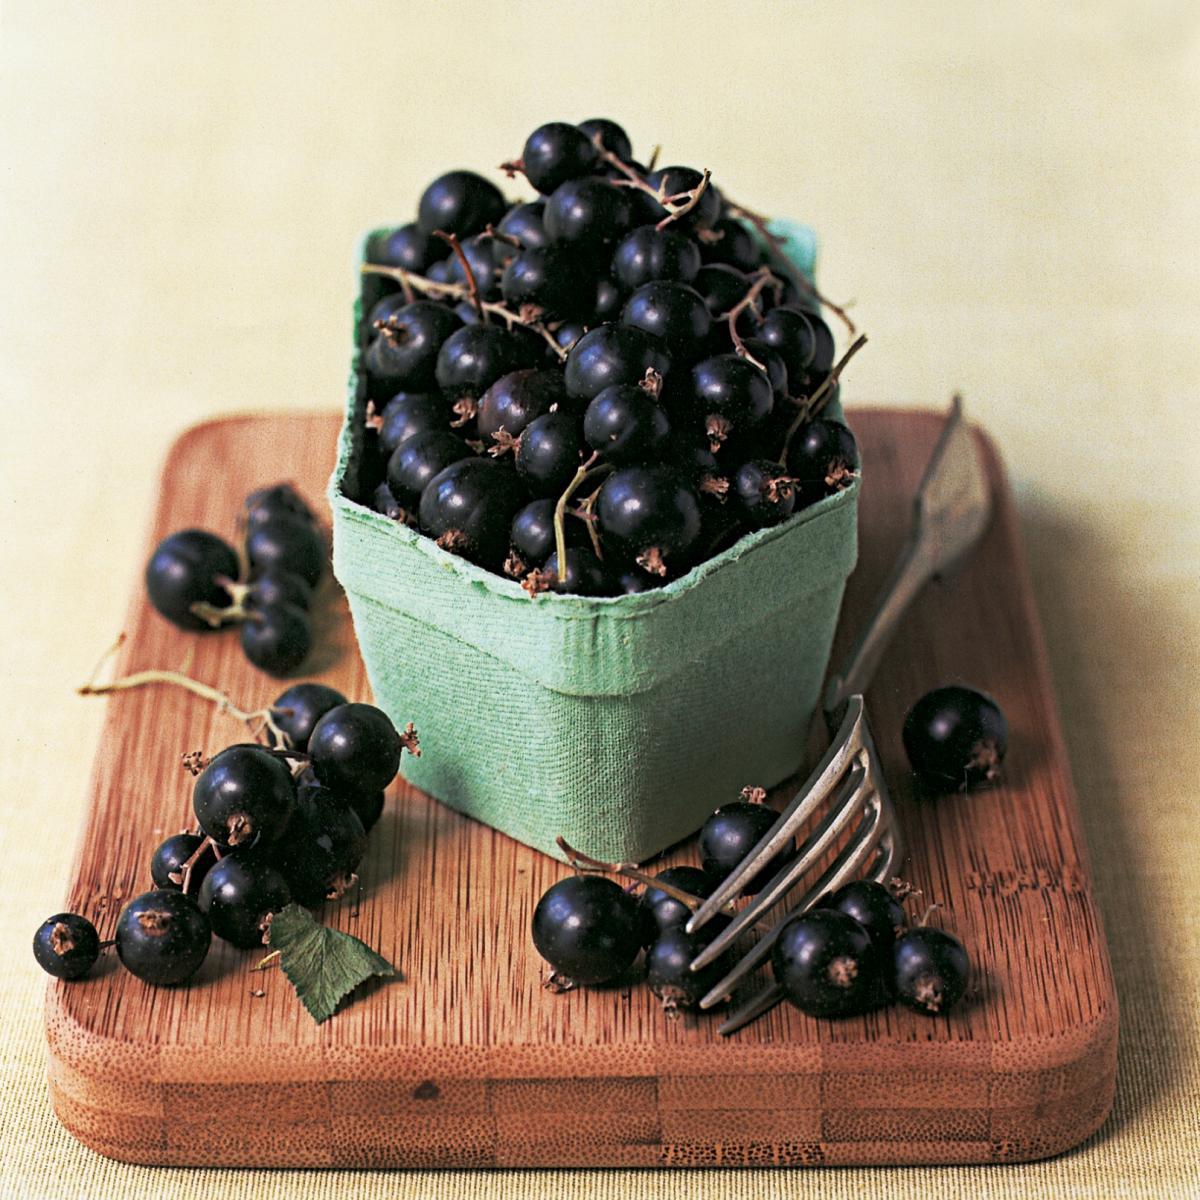 Ingredient puddings blackcurrants